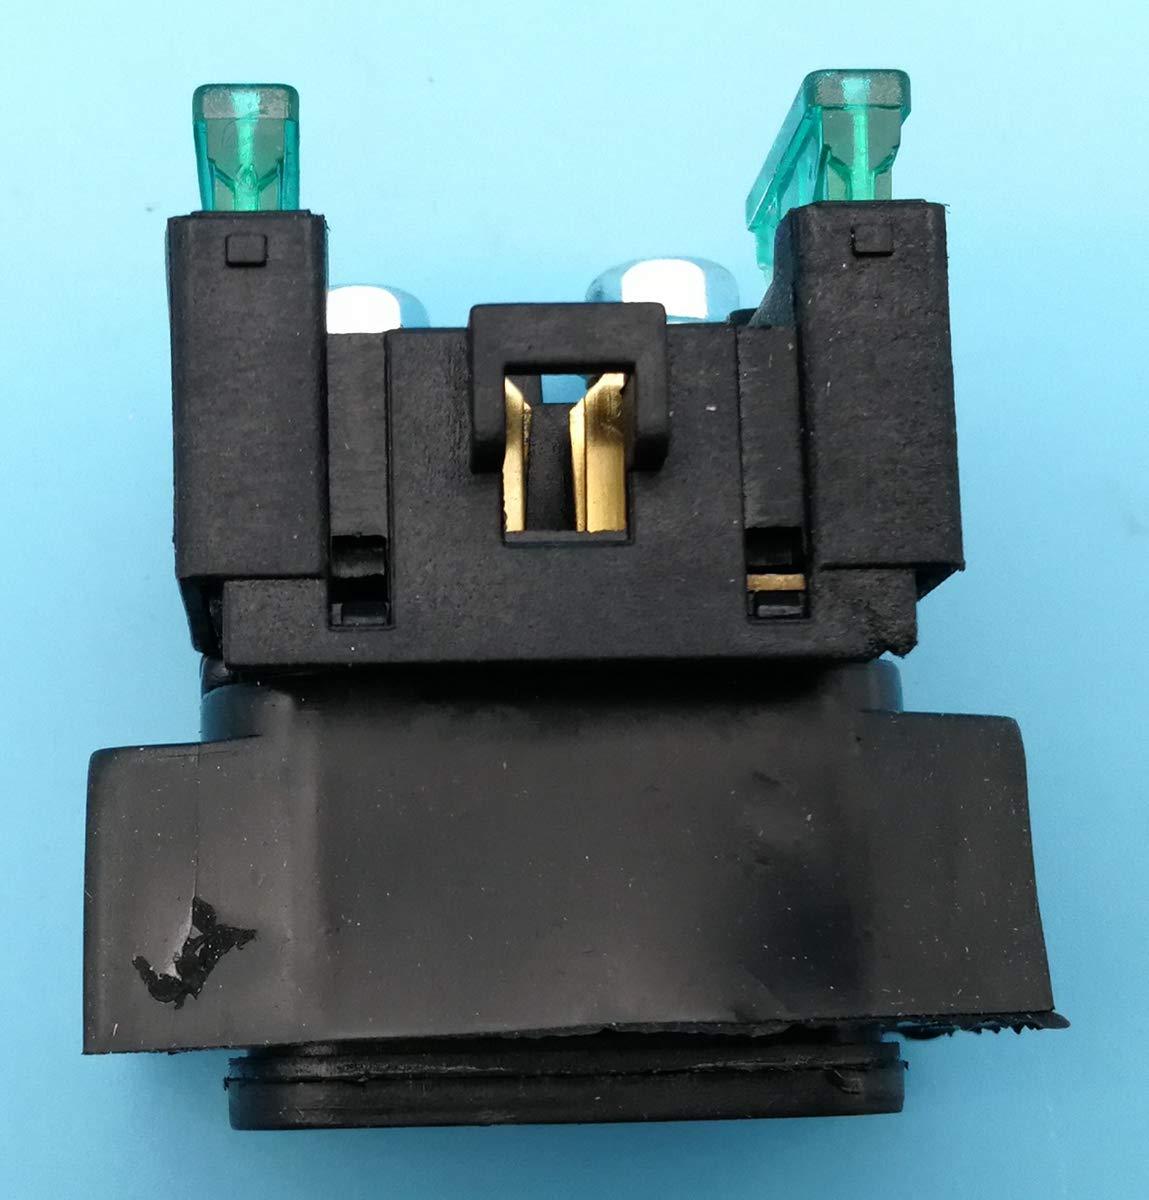 Tuzliufi Replace Starter Solenoid Relay Yamaha 600 650 700 1100 1300 1600 1700 VMX17 V-MAX VK VK10L V-STAR VT600 VT700 VX600 VX700 XV17 XV19 XV1600 XV1700 XV1900 XVS11 XVS650 XVS1100 XVZ1300 New Z257